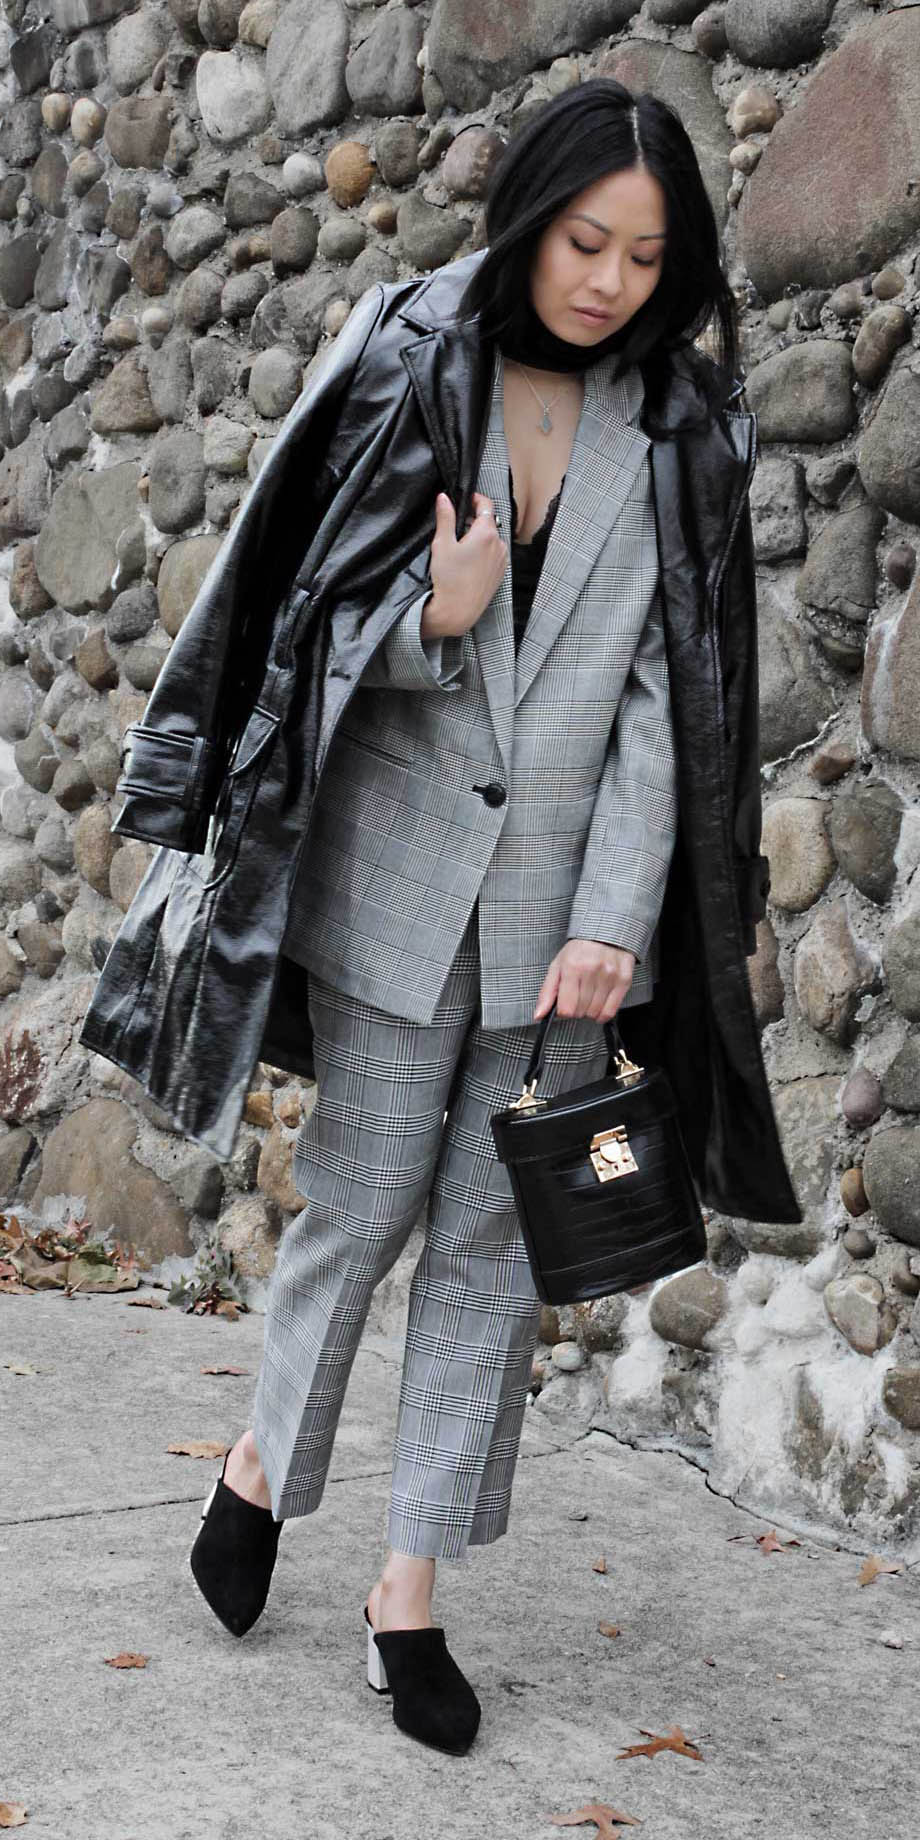 grayl-slim-pants-grayl-jacket-blazer-black-bag-brun-black-shoe-pumps-jacket-coat-trench-fall-winter-dinner.jpg